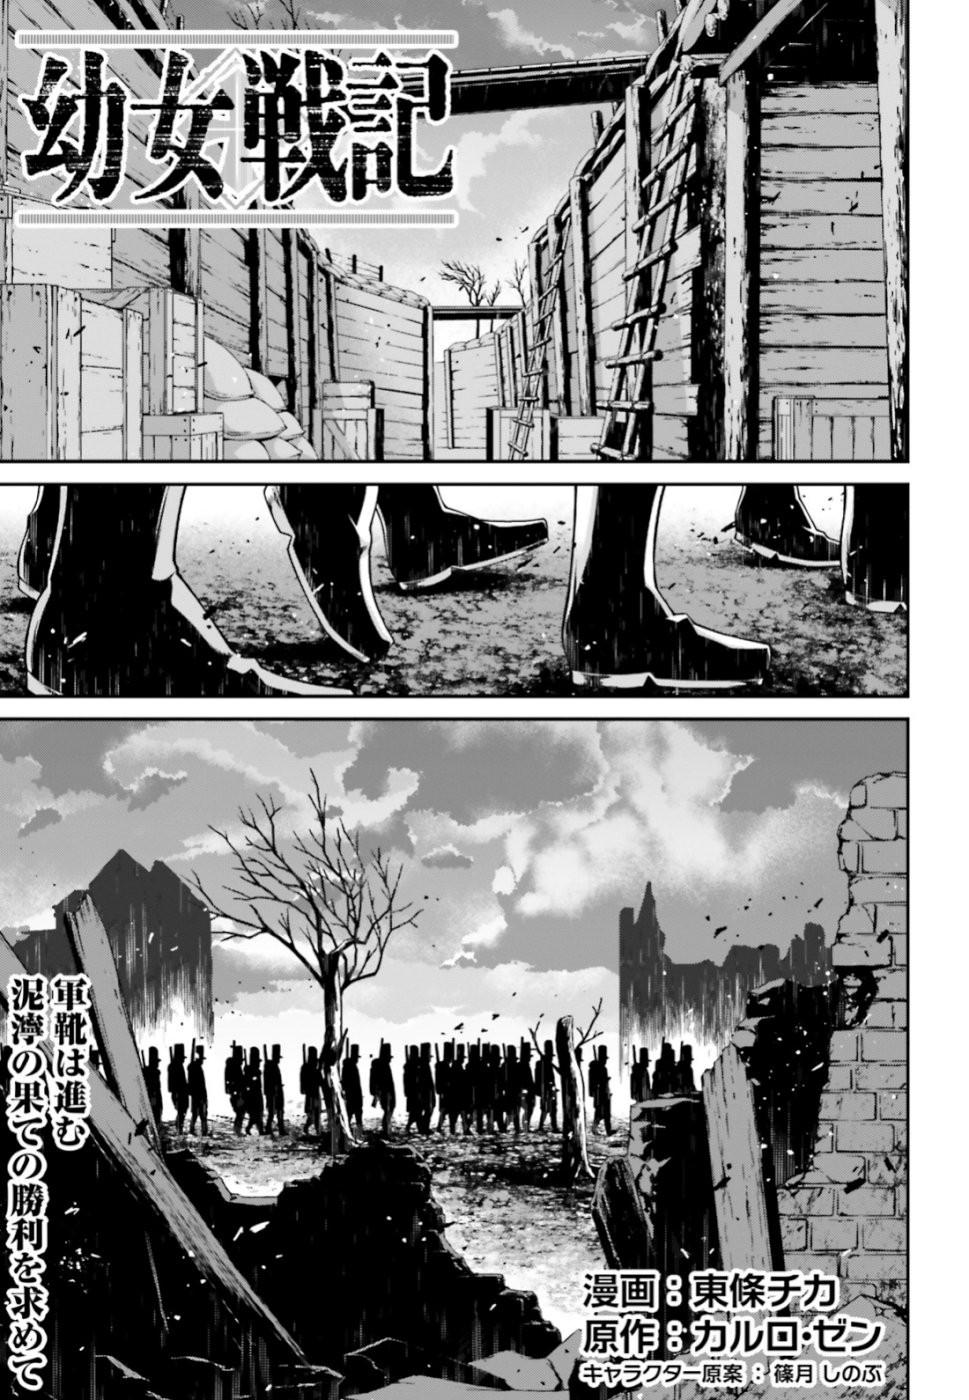 Youjo Senki - Chapter 51 - Page 1